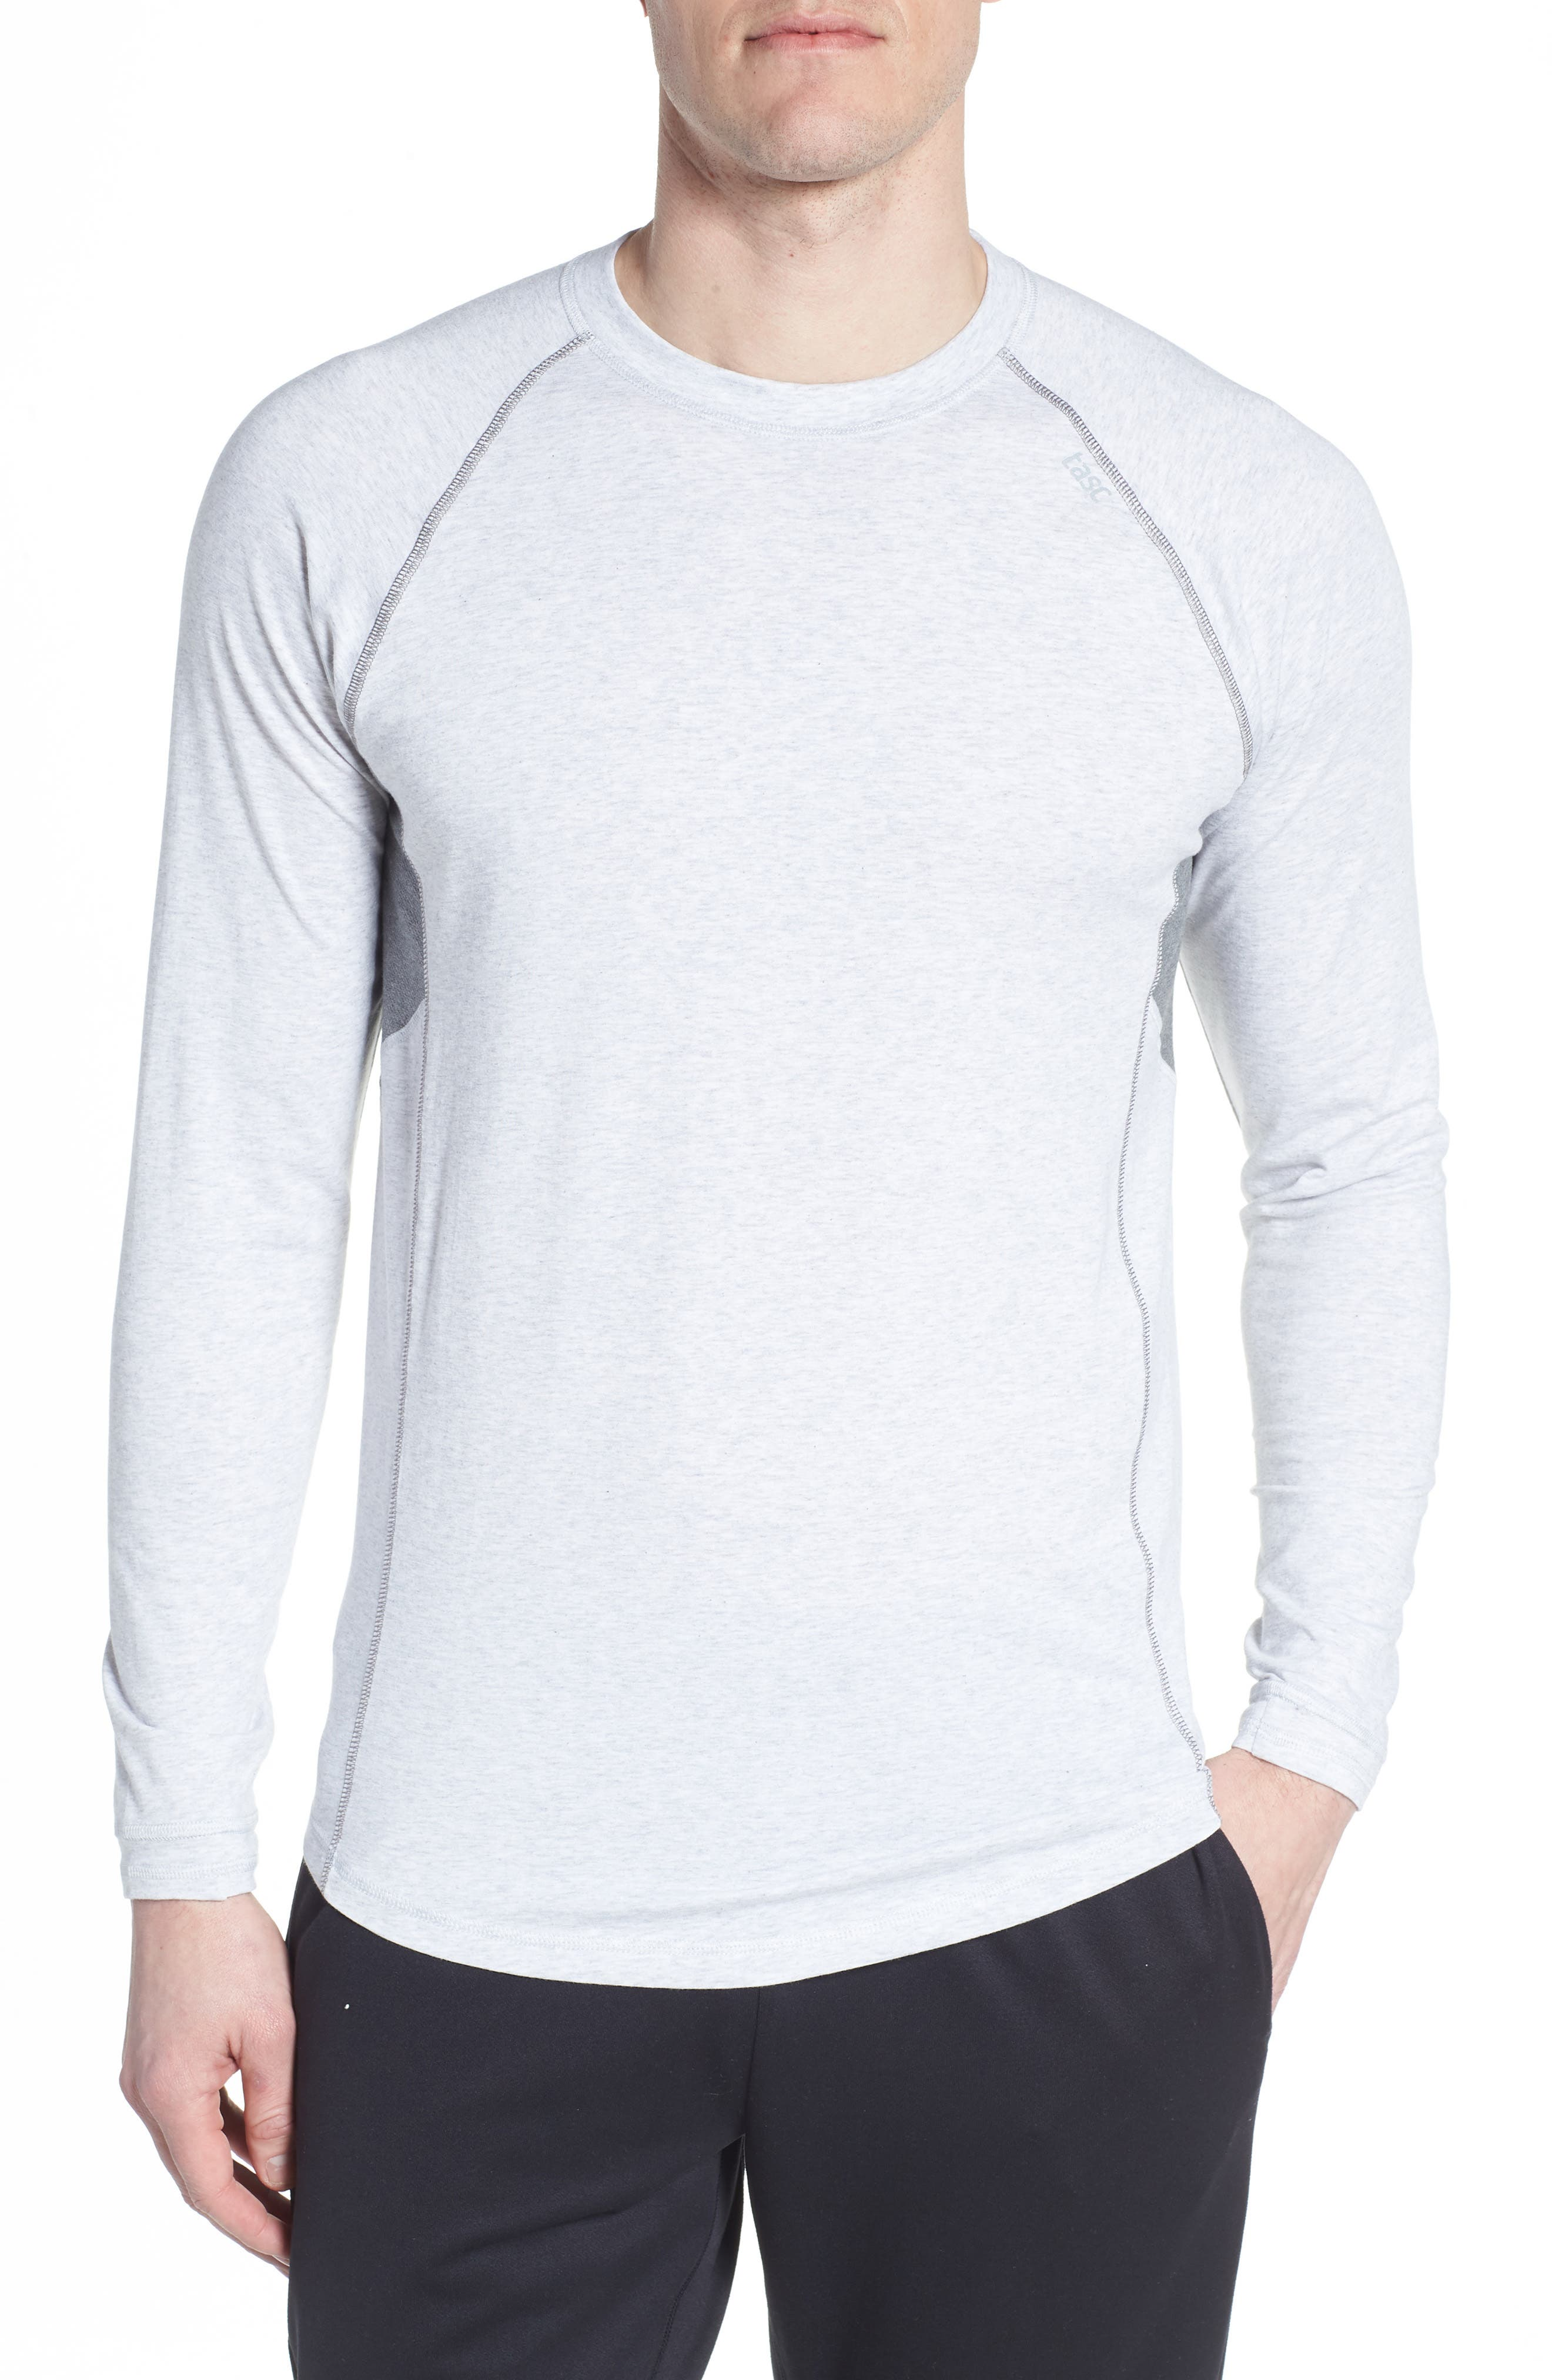 Charge II Long Sleeve Shirt,                         Main,                         color, Light Heather Gray